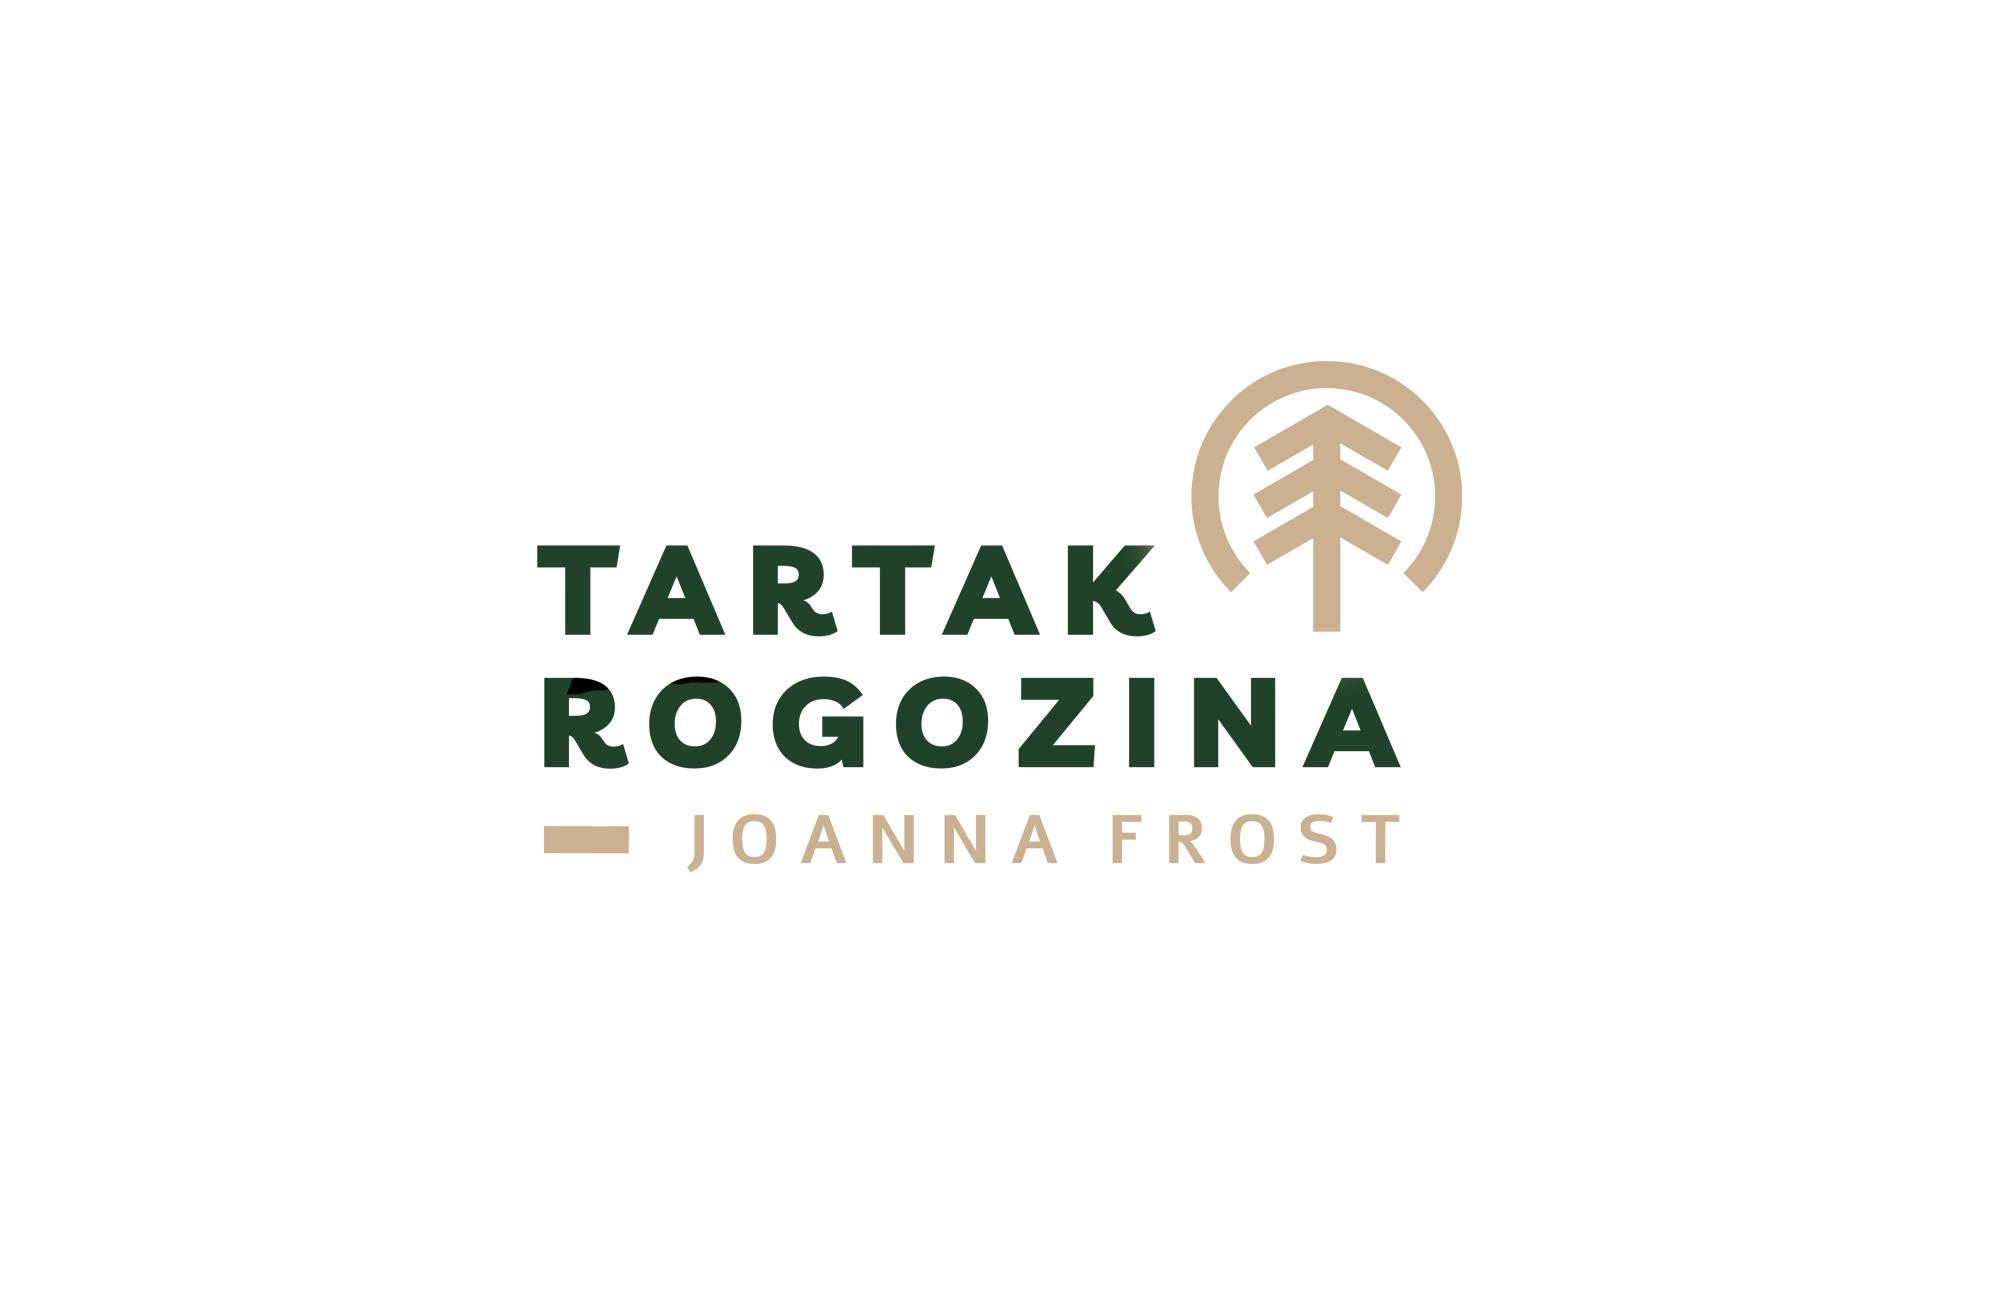 Tartak Rogozina. Shadowart - logo, strona internetowa.